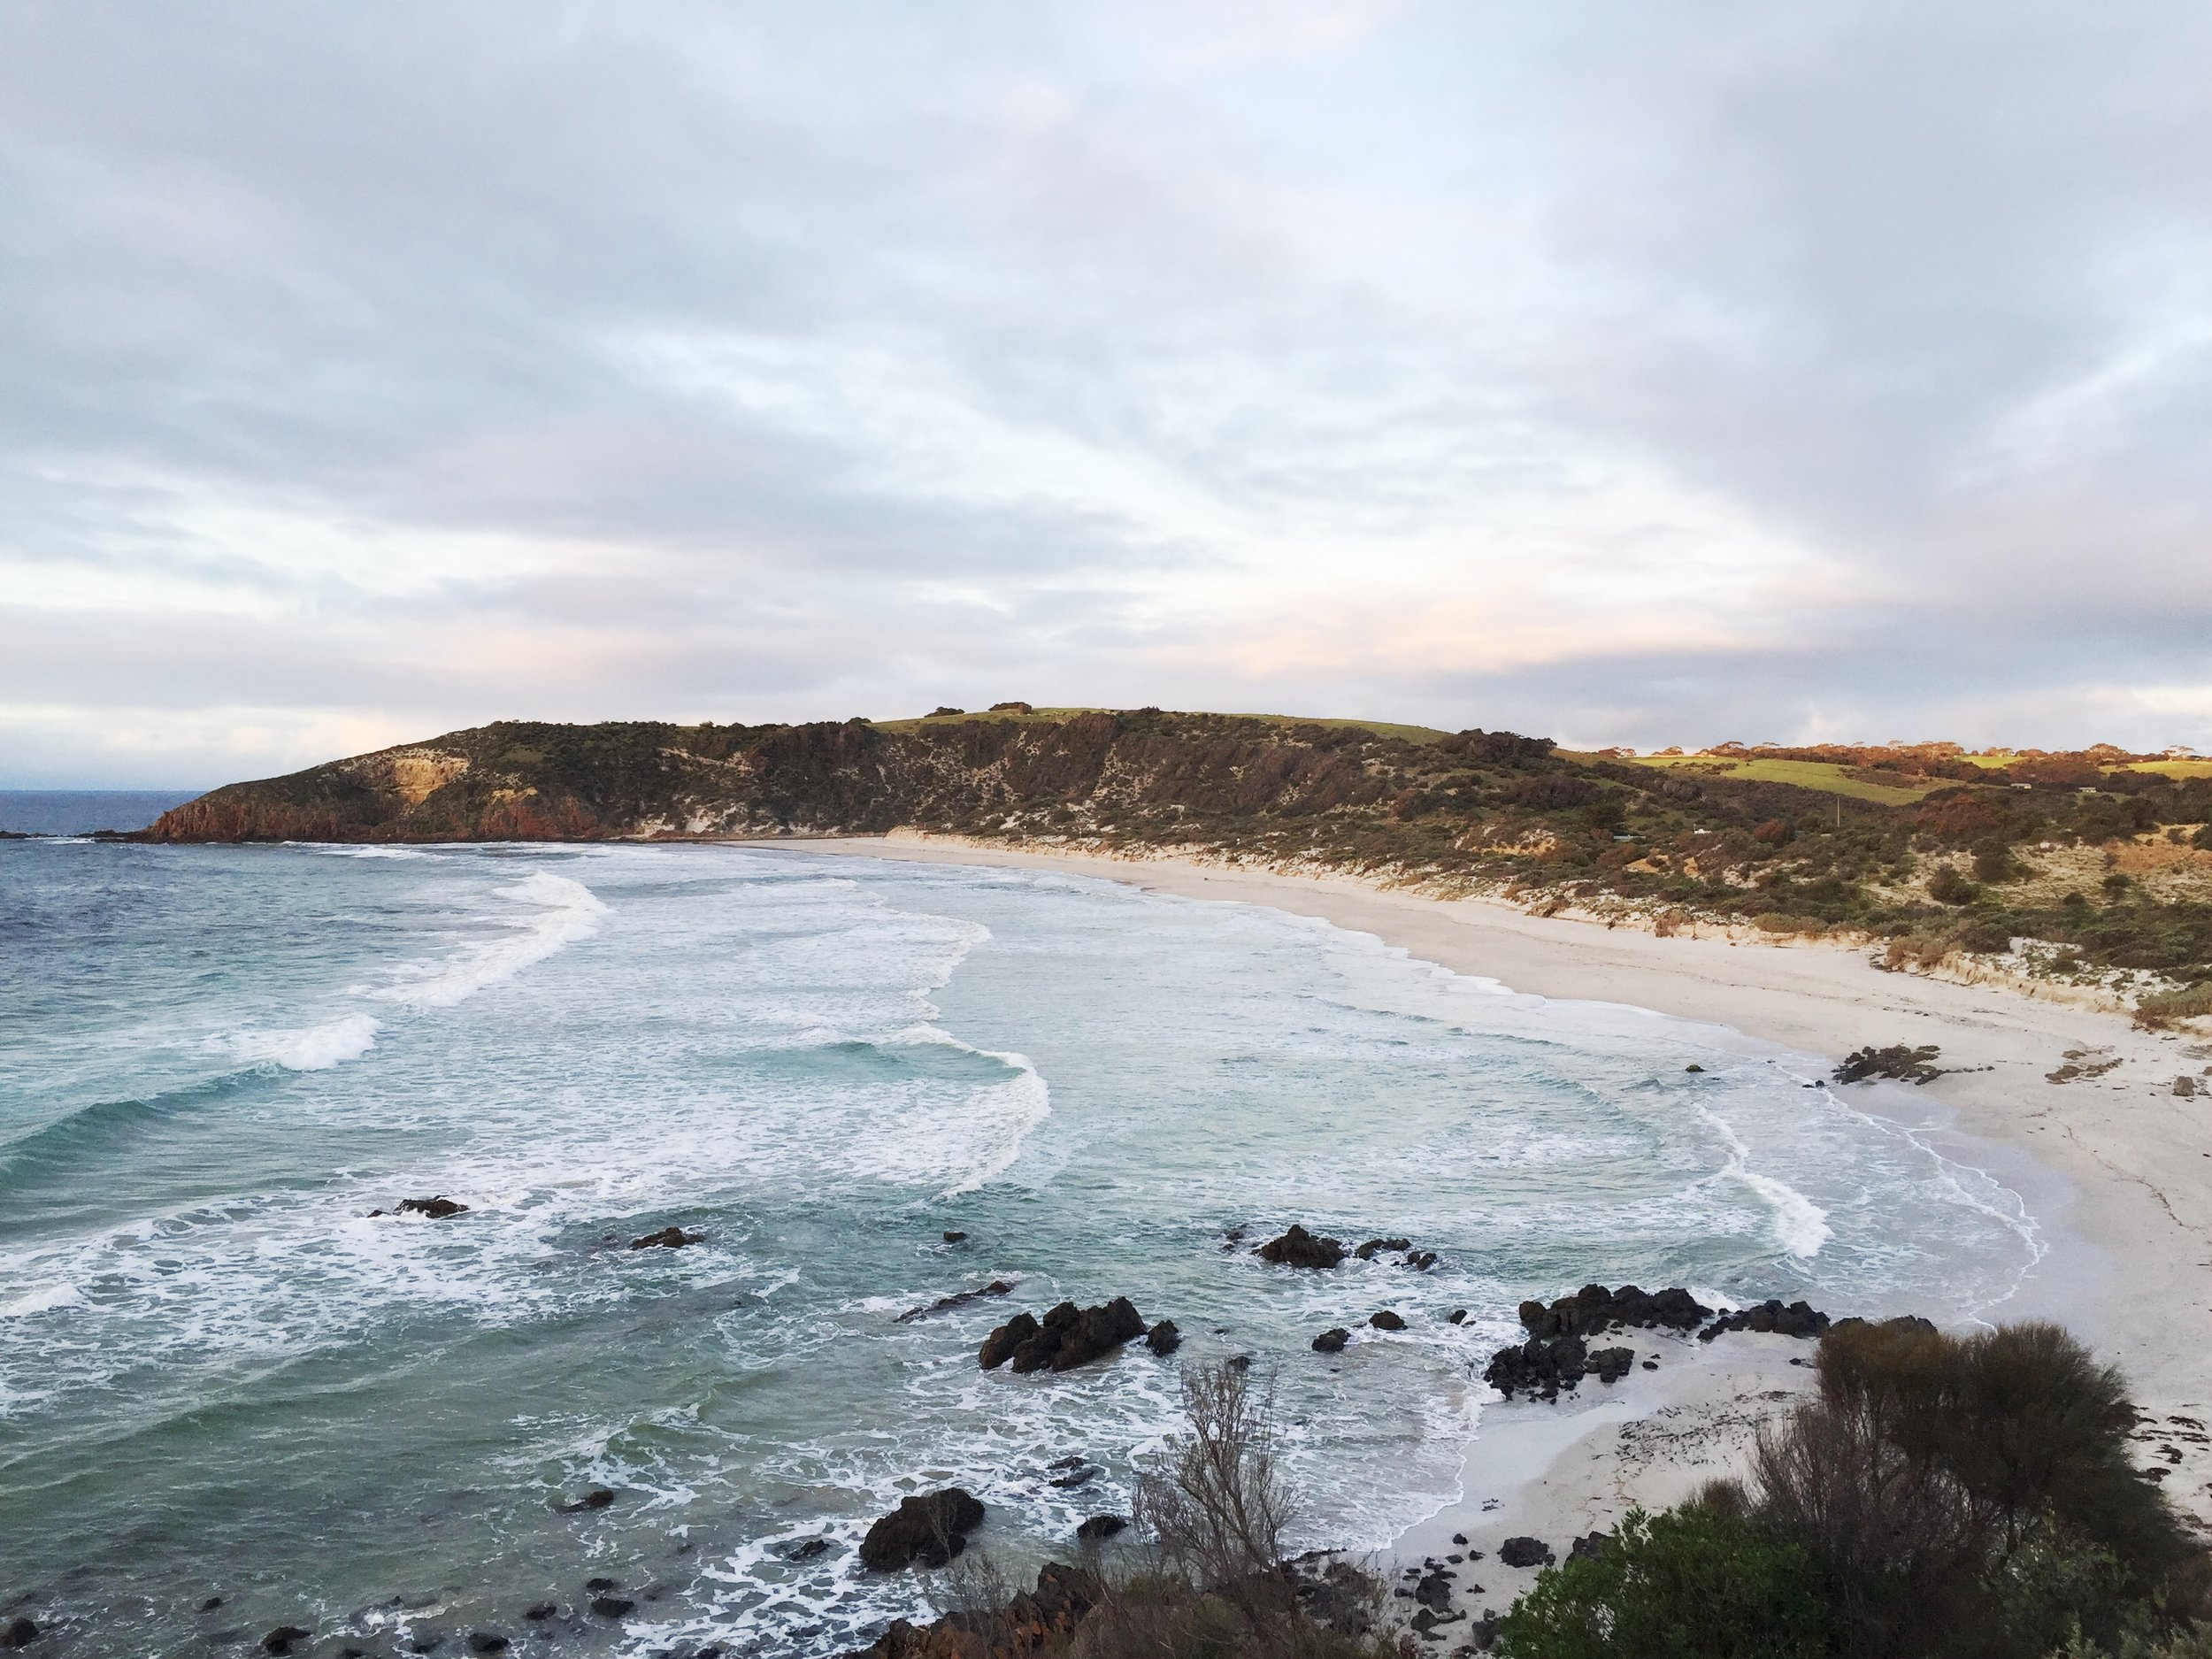 Hike and explore Australia's gorgeous coastlines